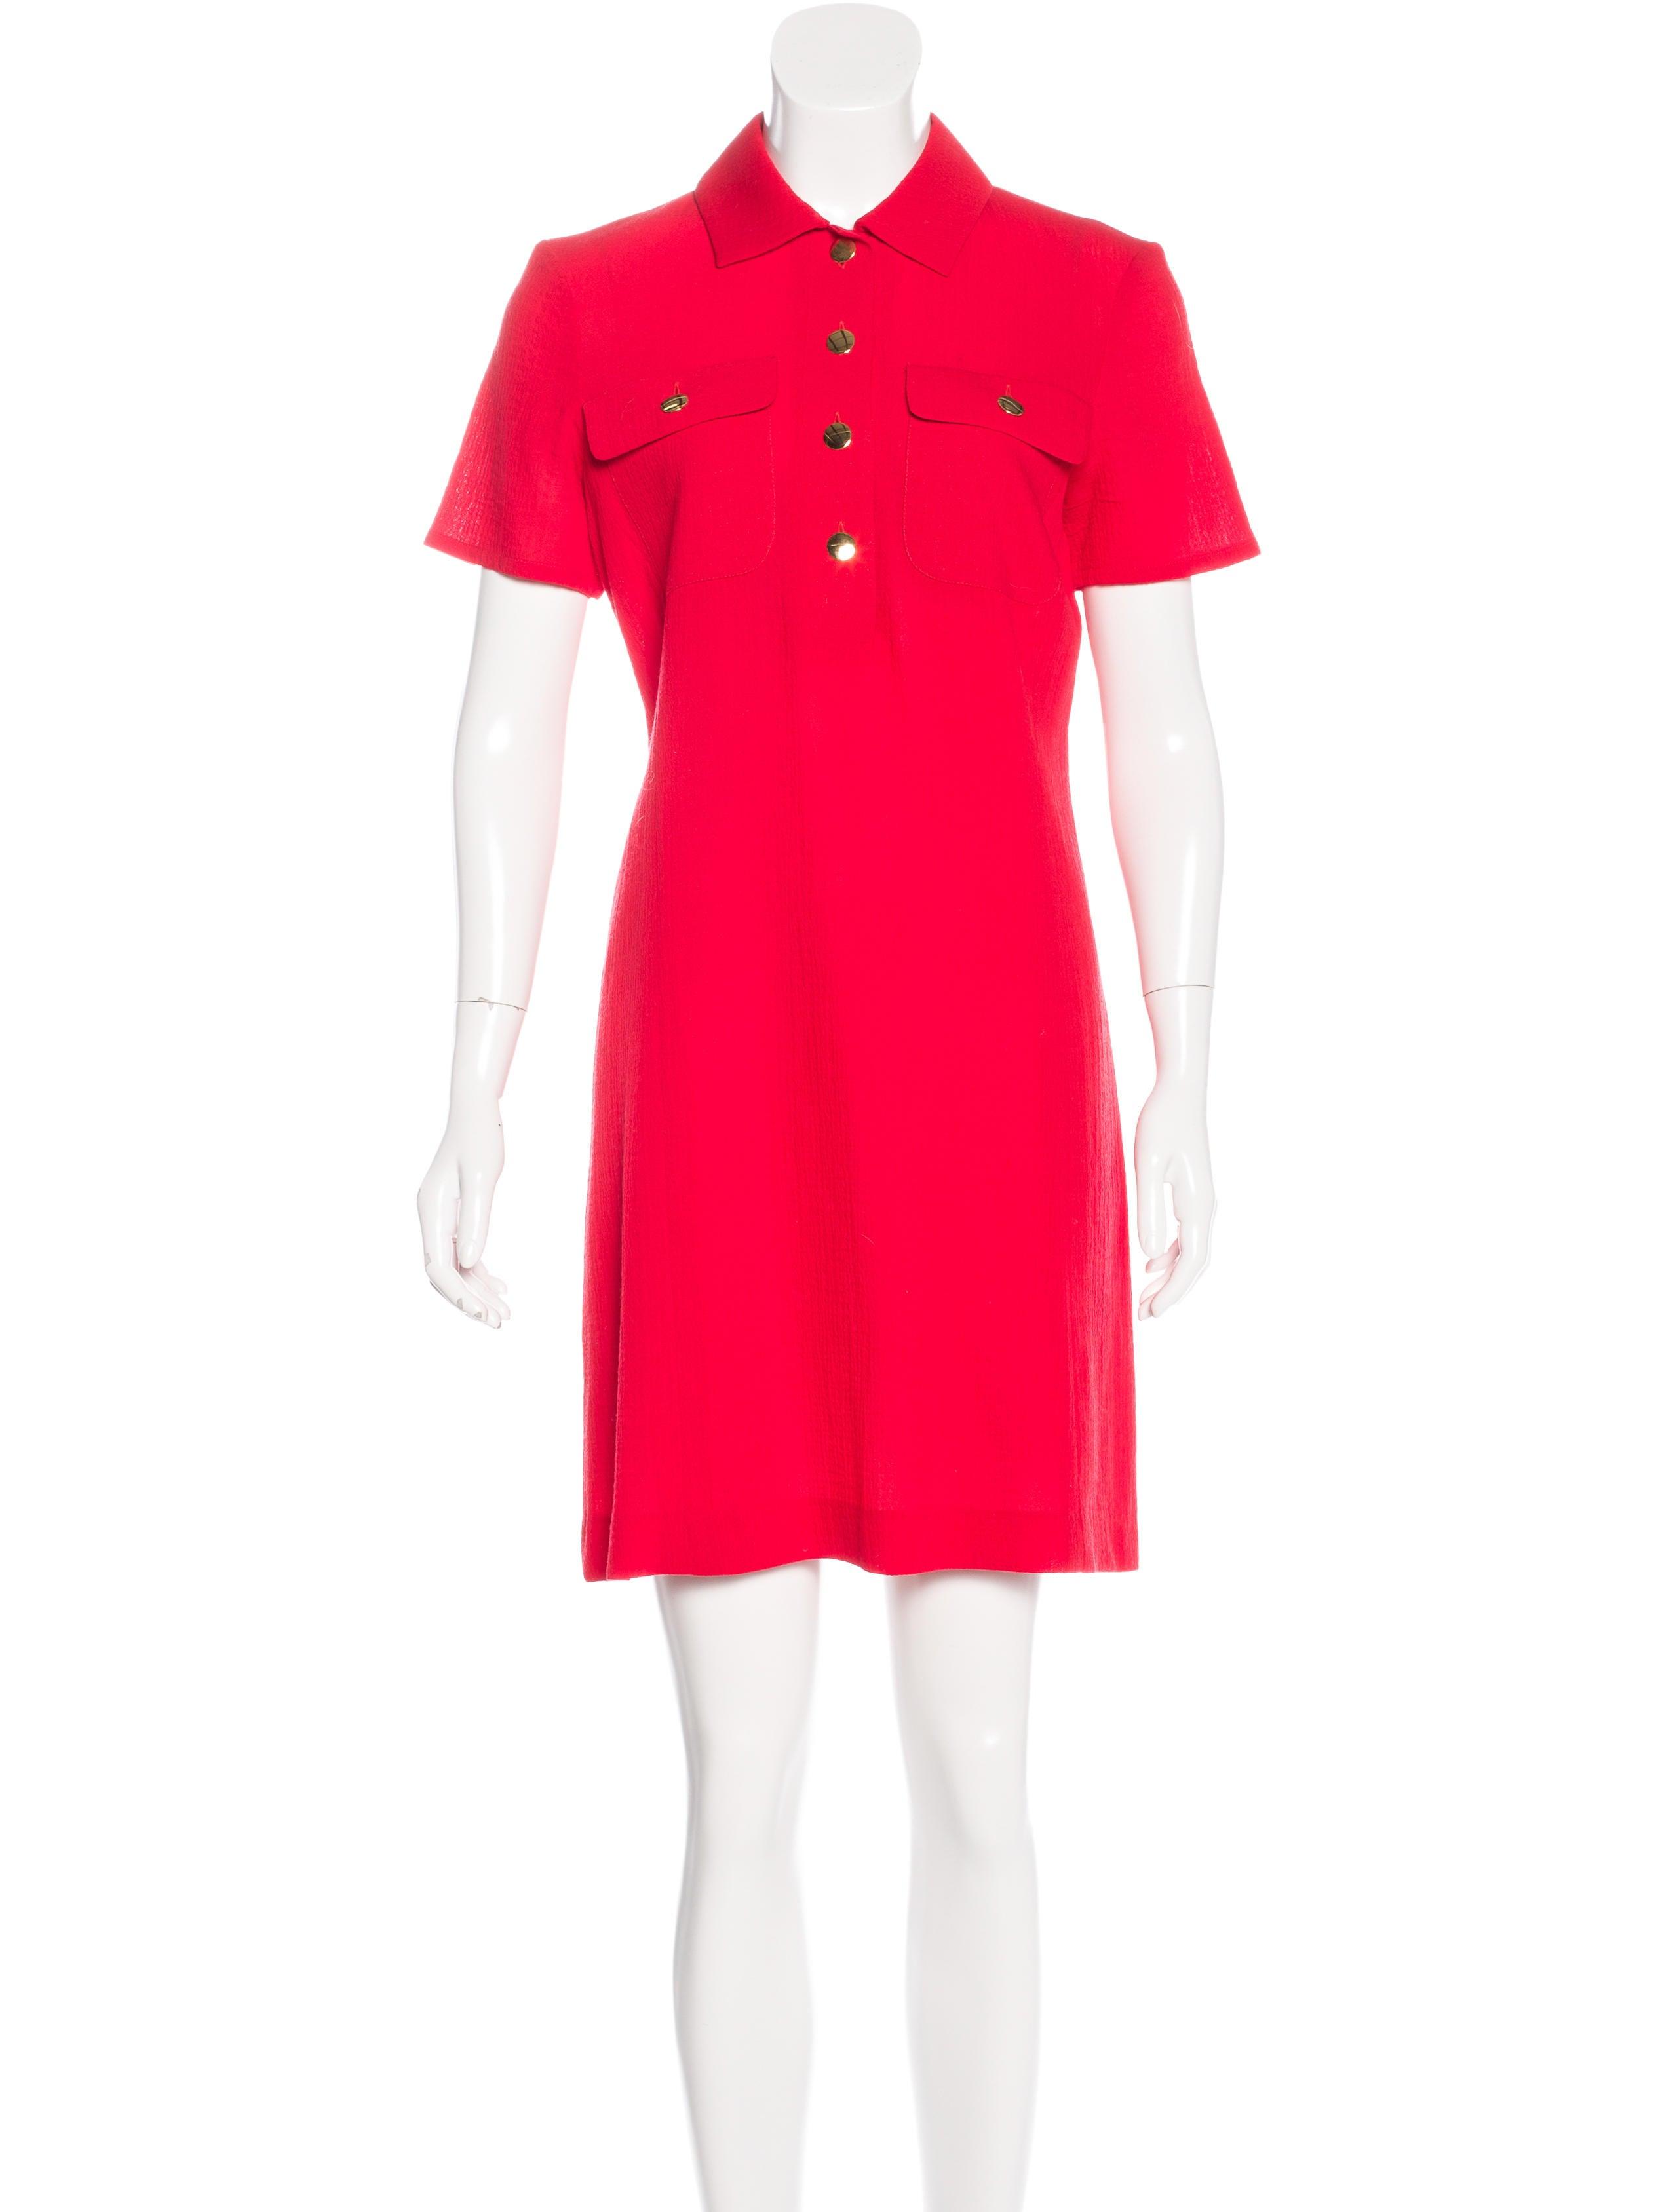 Yves saint laurent wool shirt dress clothing yve58252 for Saint laurent shirt womens